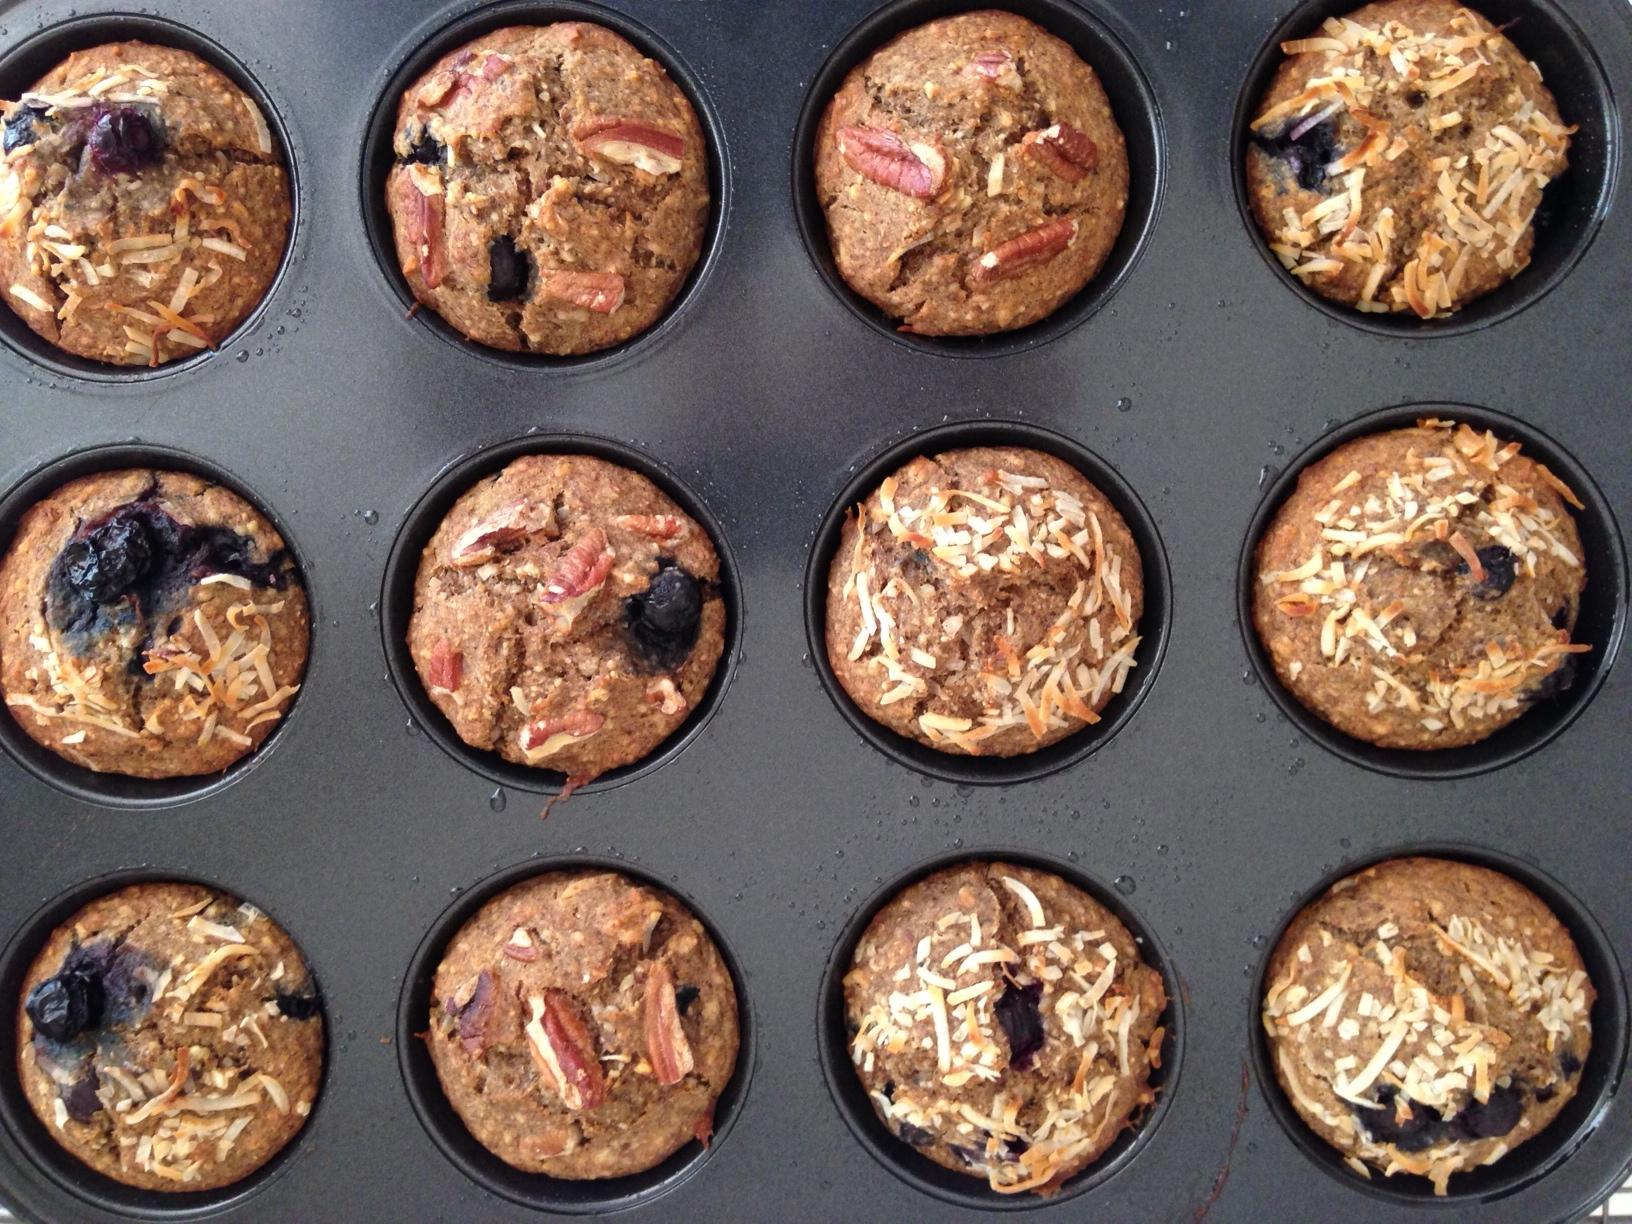 Banana + Blueberry Muffins Recipe